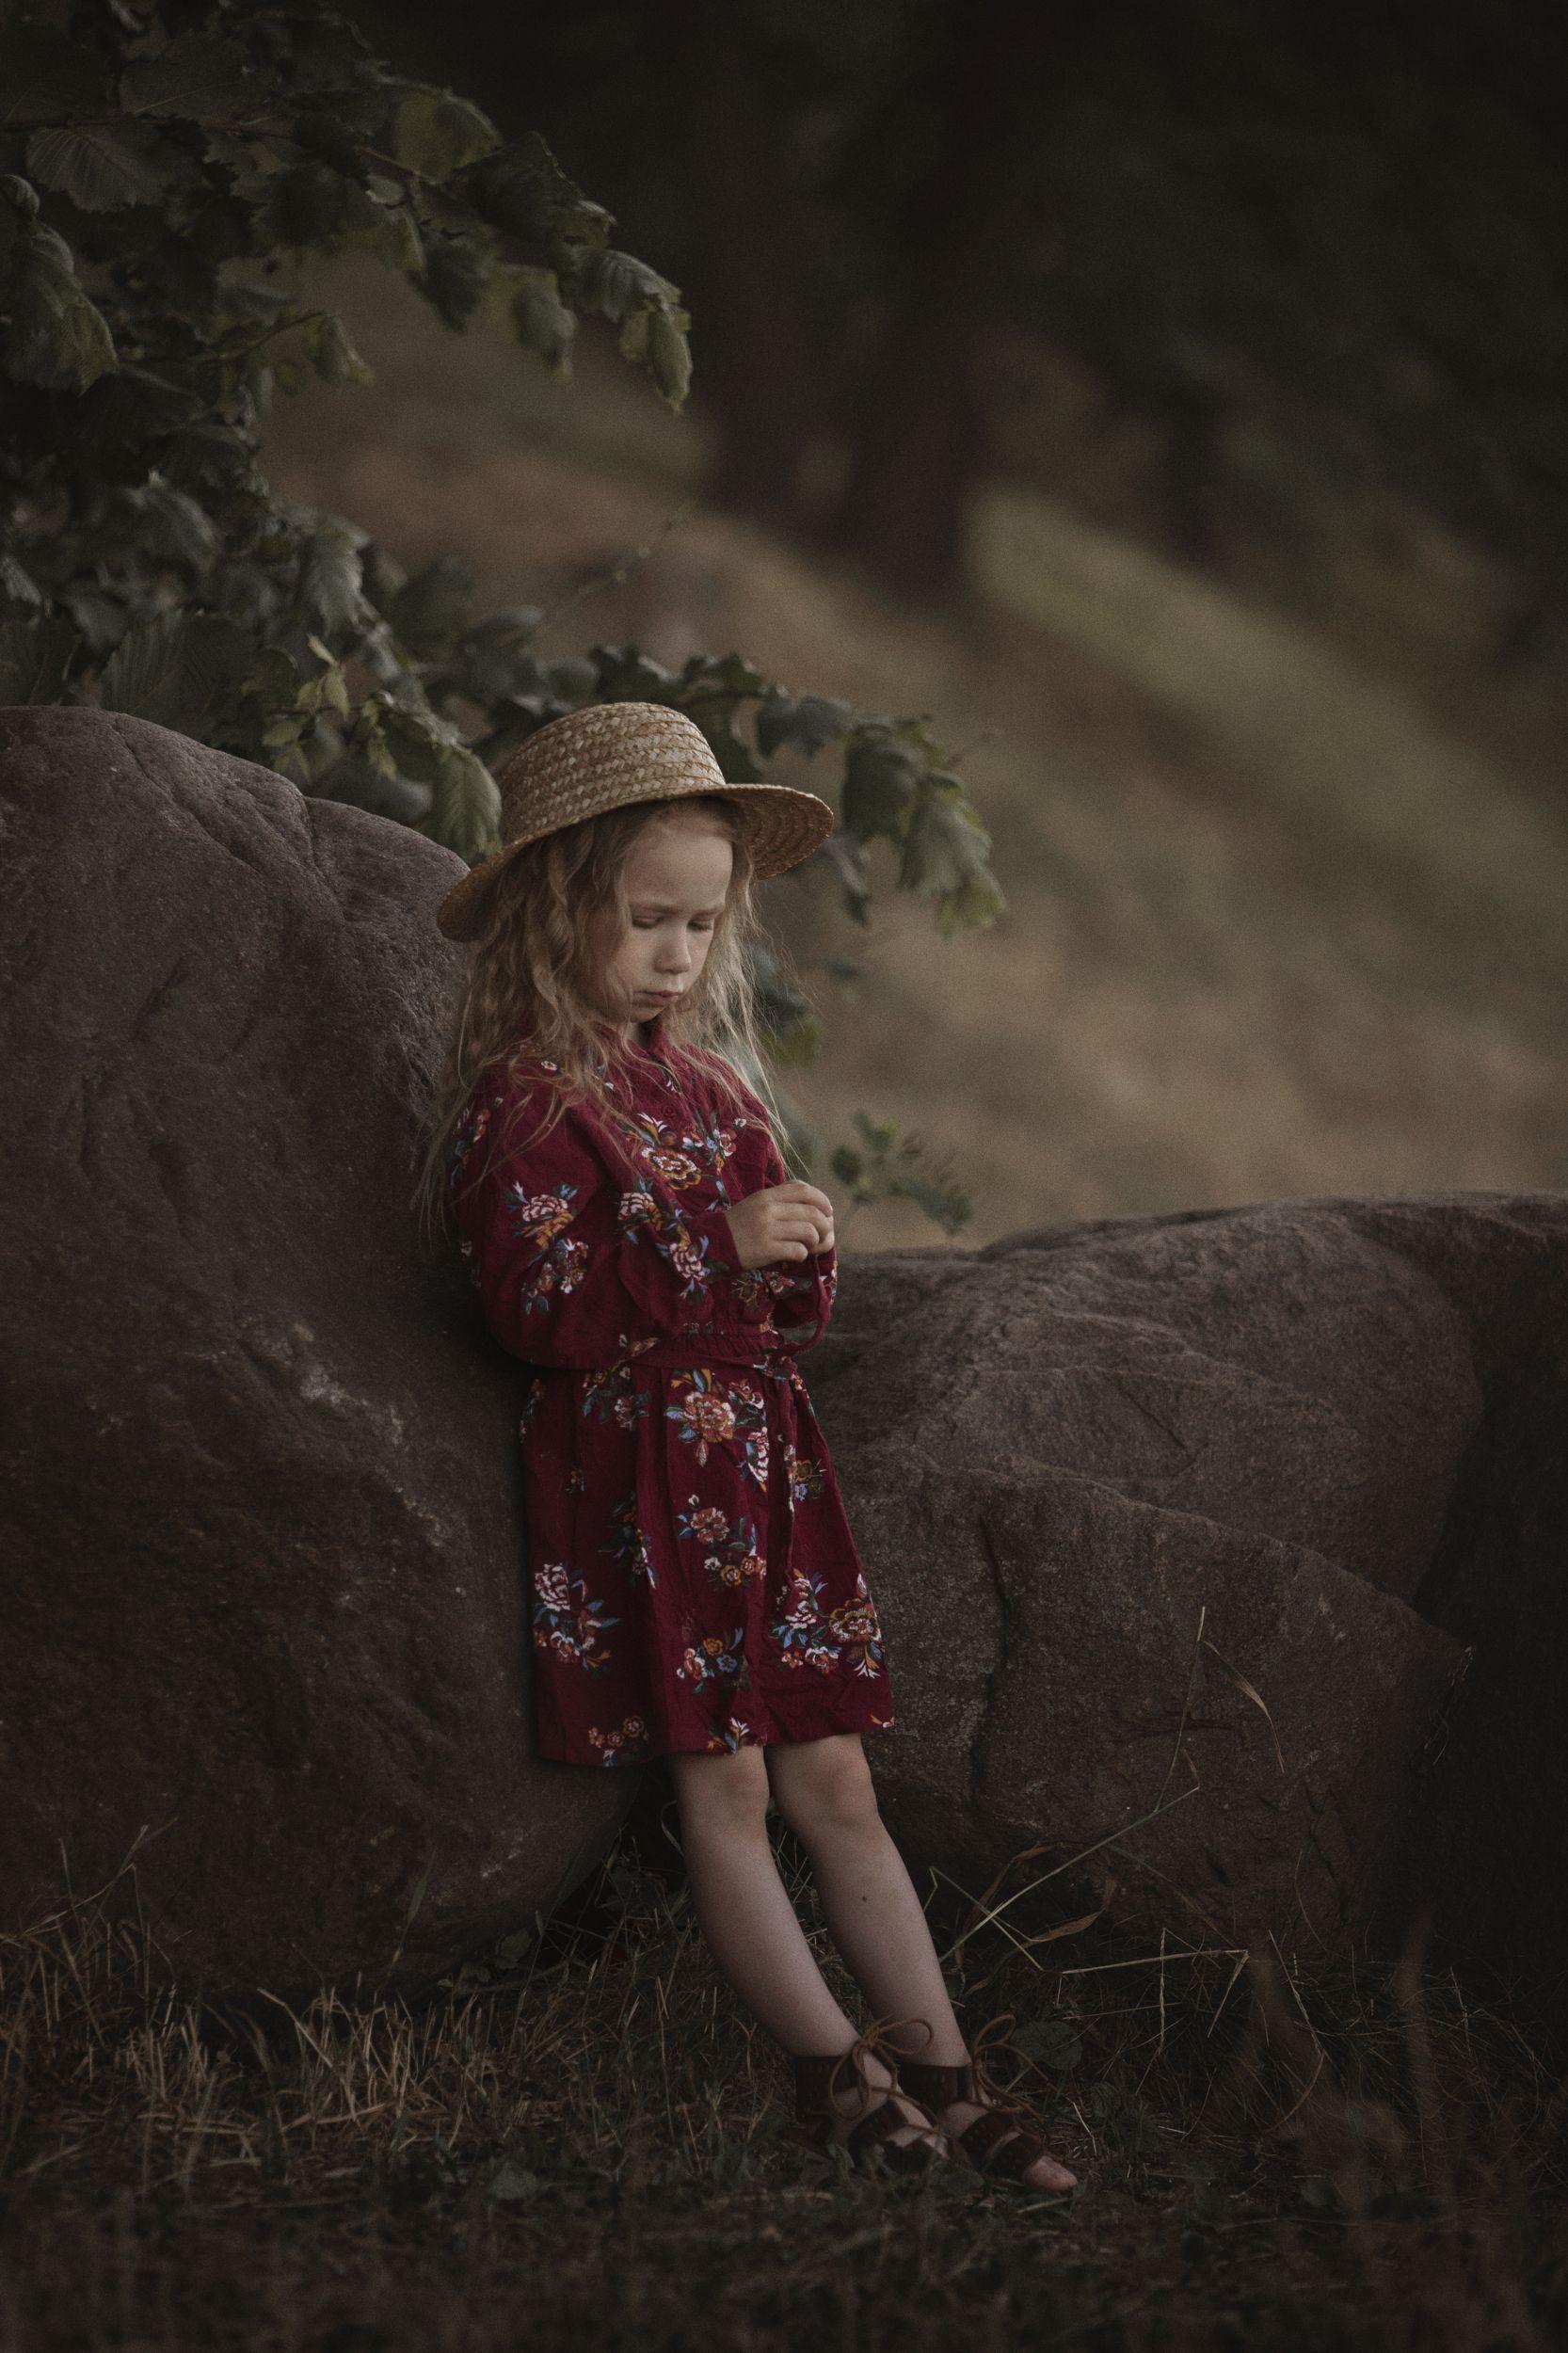 девочка шляпка прогулка лето, Скородумова Татьяна